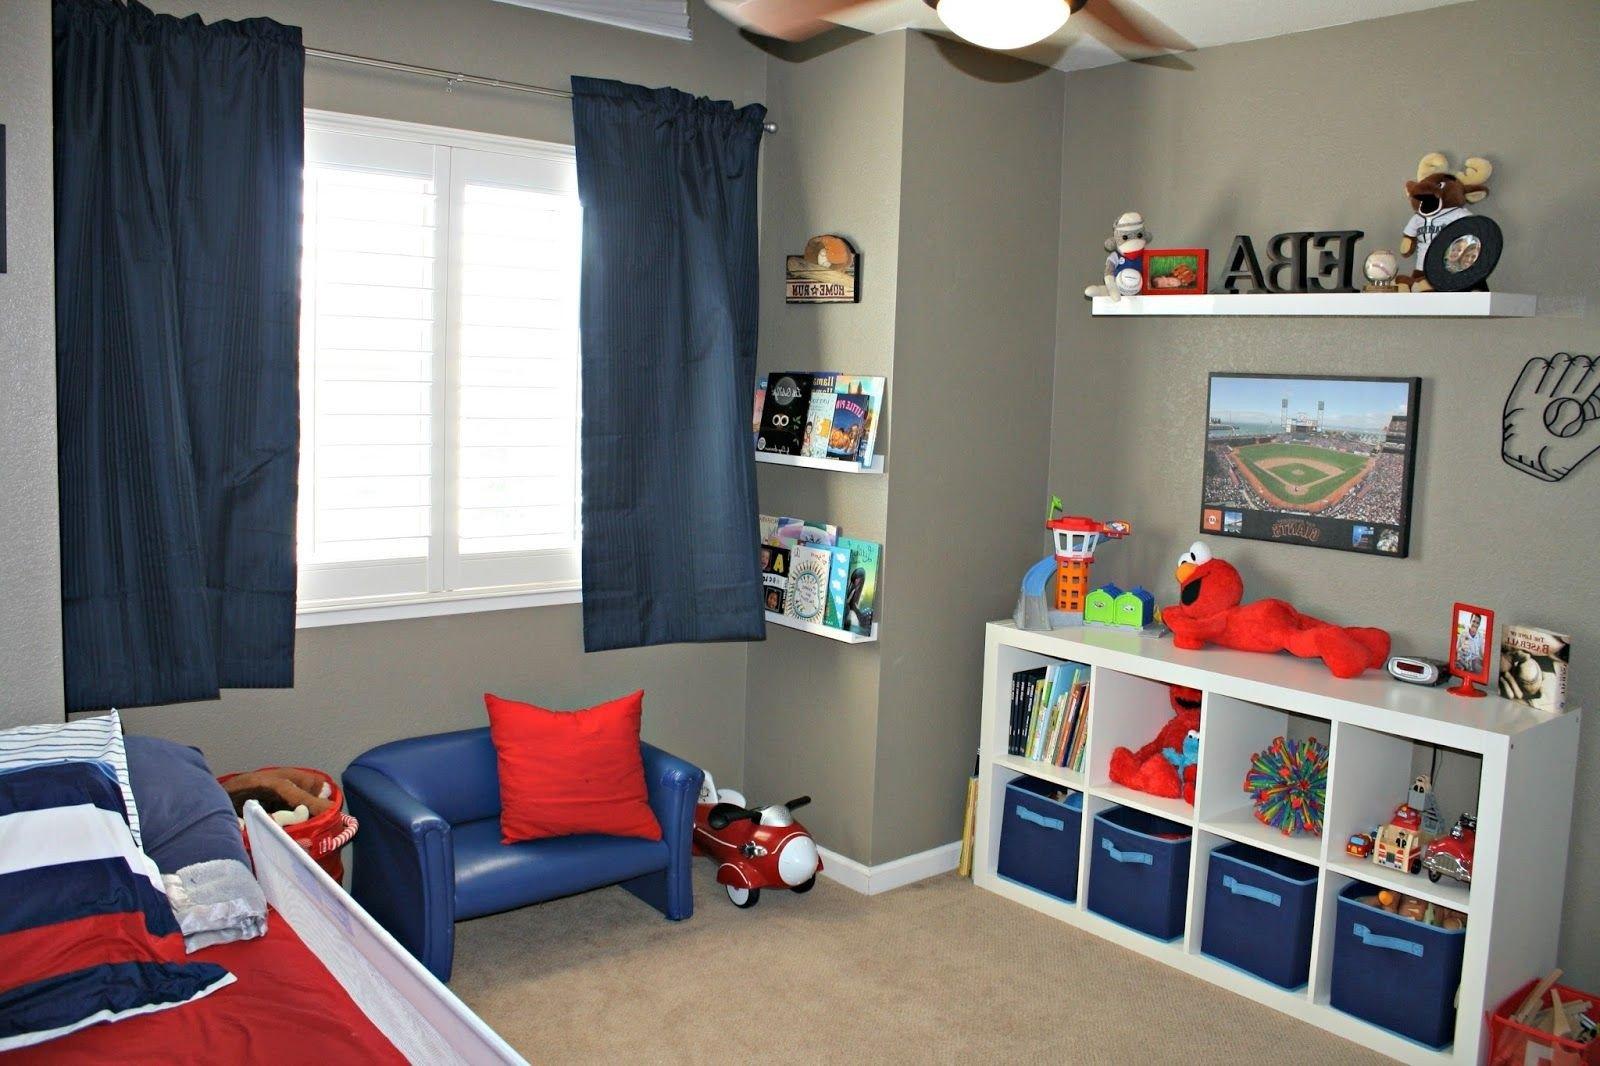 Toddler Boys Room Decor Ideas Unique Boy Bedroom Ideas Visi Build 3d Home Decor In 2019